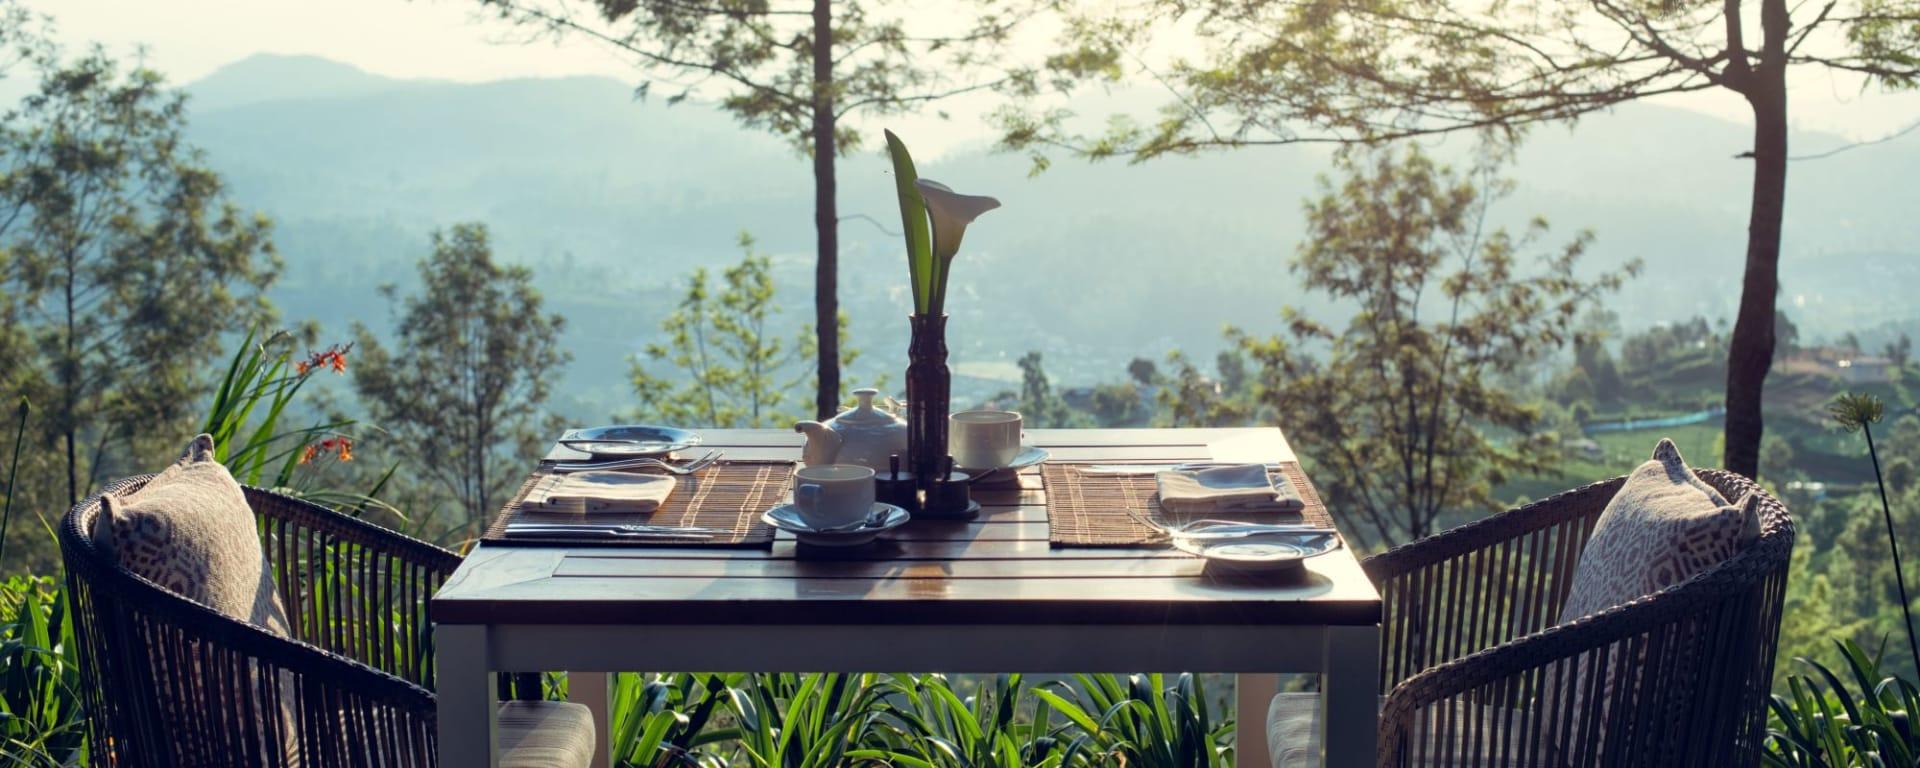 Goatfell in Nuwara Eliya: Dining